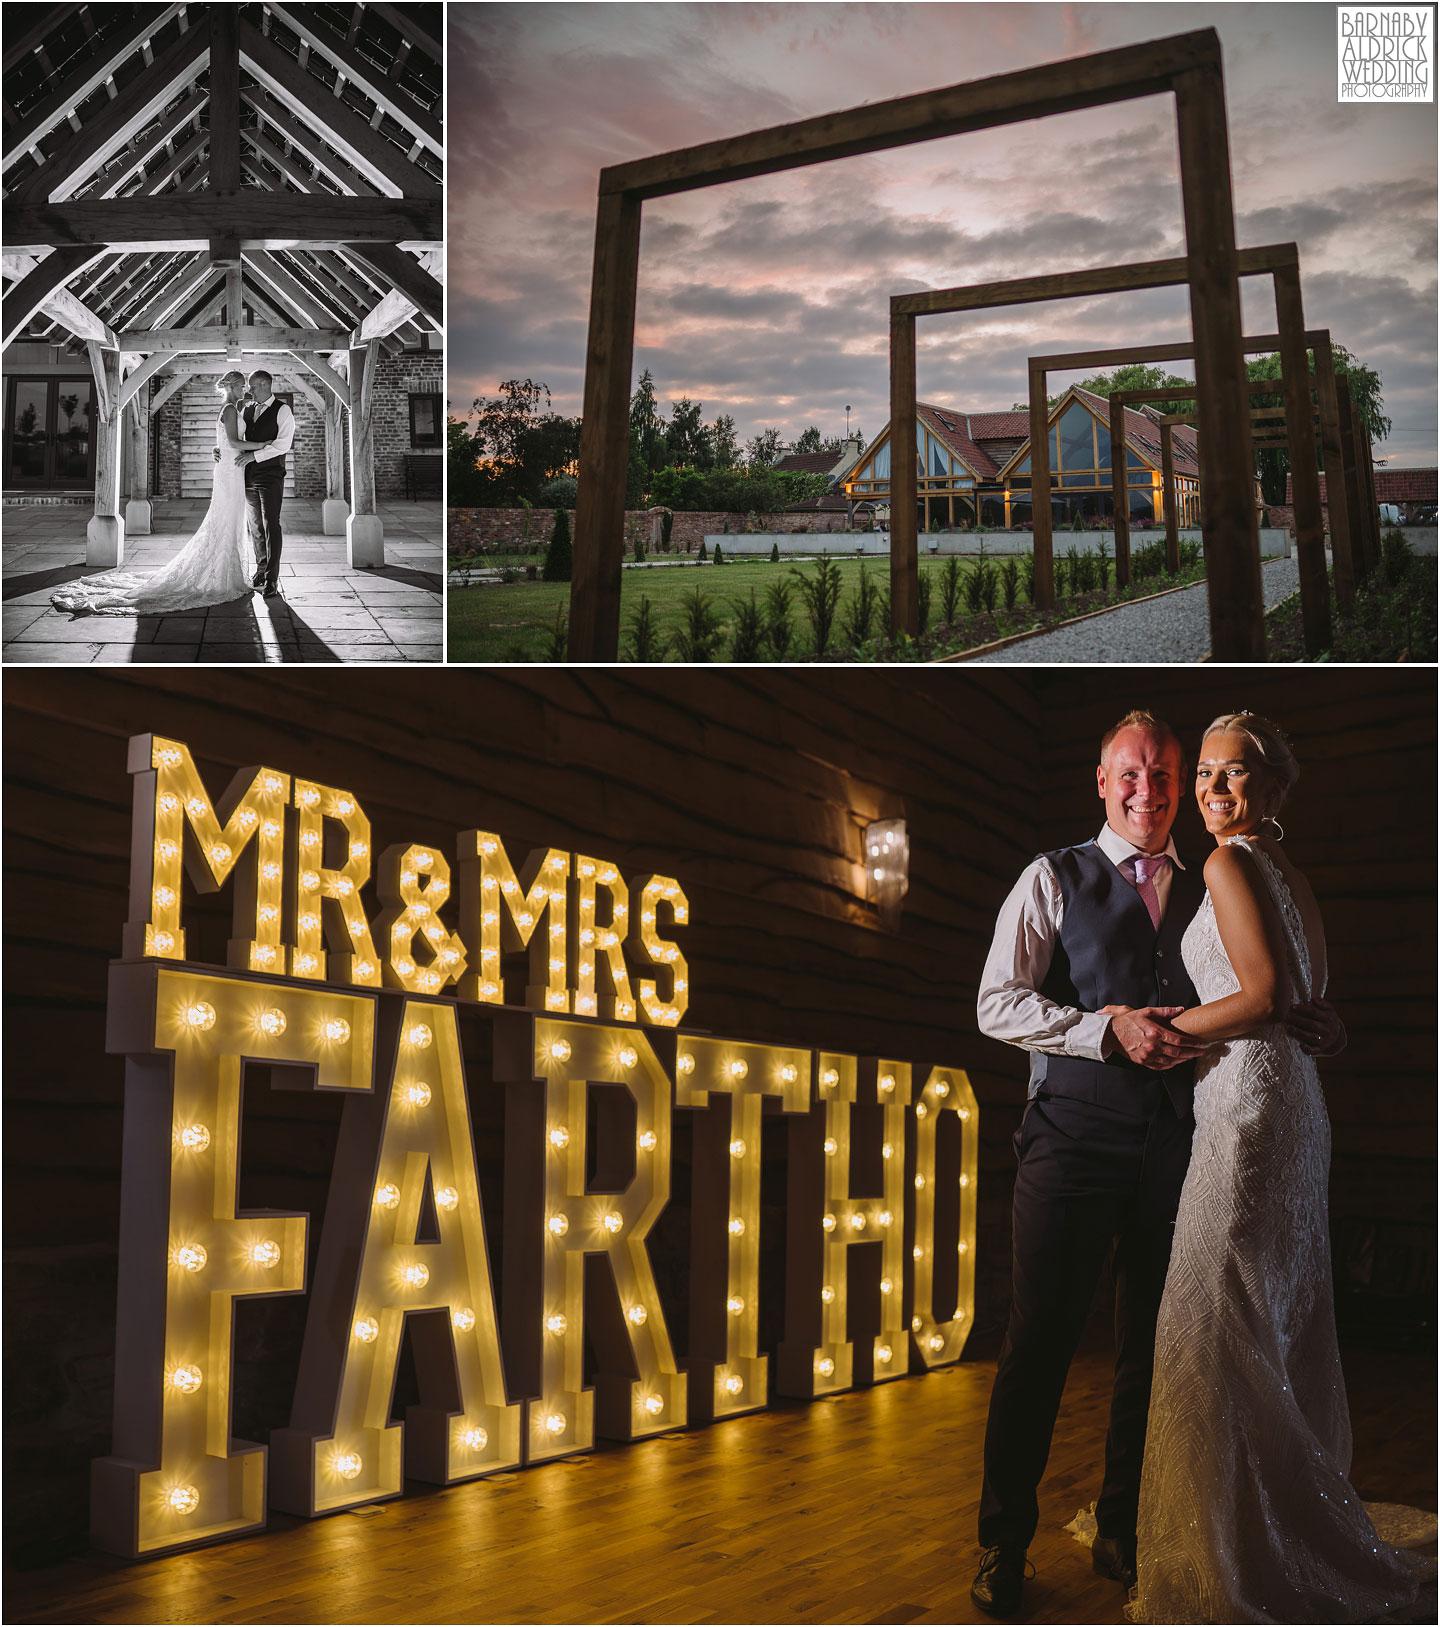 Evening wedding photos, Wedding at The Oakwood at Ryther, Oakwood at Ryther wedding photographer, The Oakwood at Ryther wedding photos, Stylish Yorkshire wedding barn venue